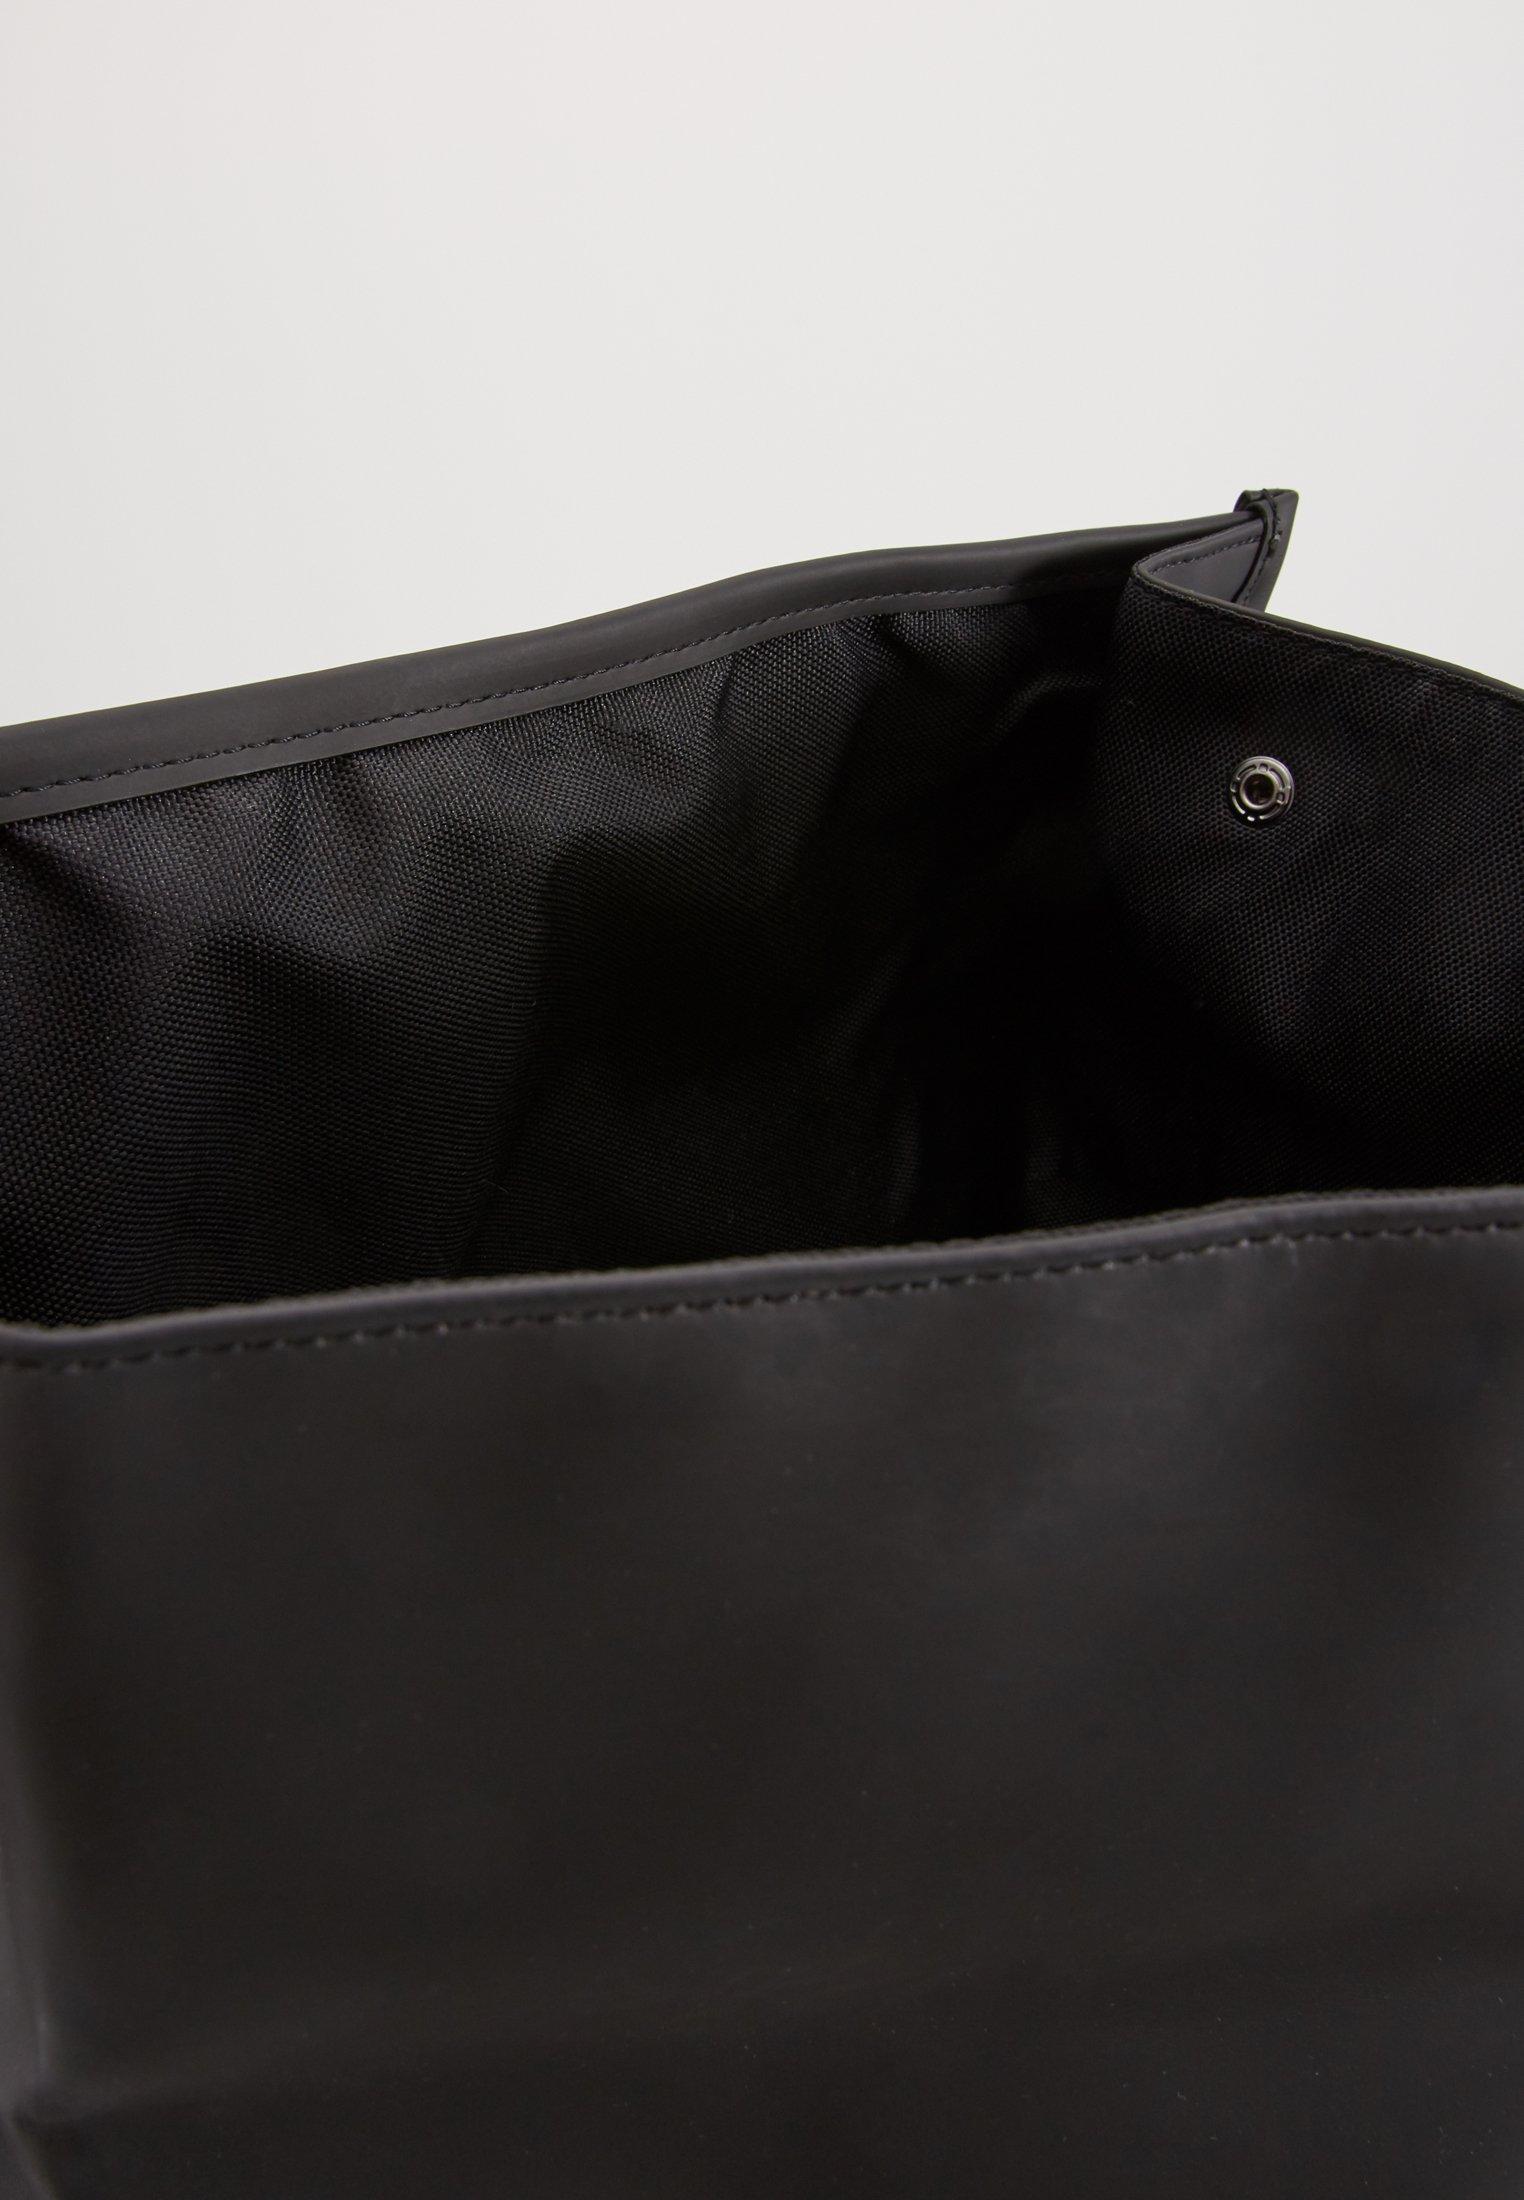 Rains ROLL TOP - Tagesrucksack - black/schwarz - Herrentaschen IeqFT